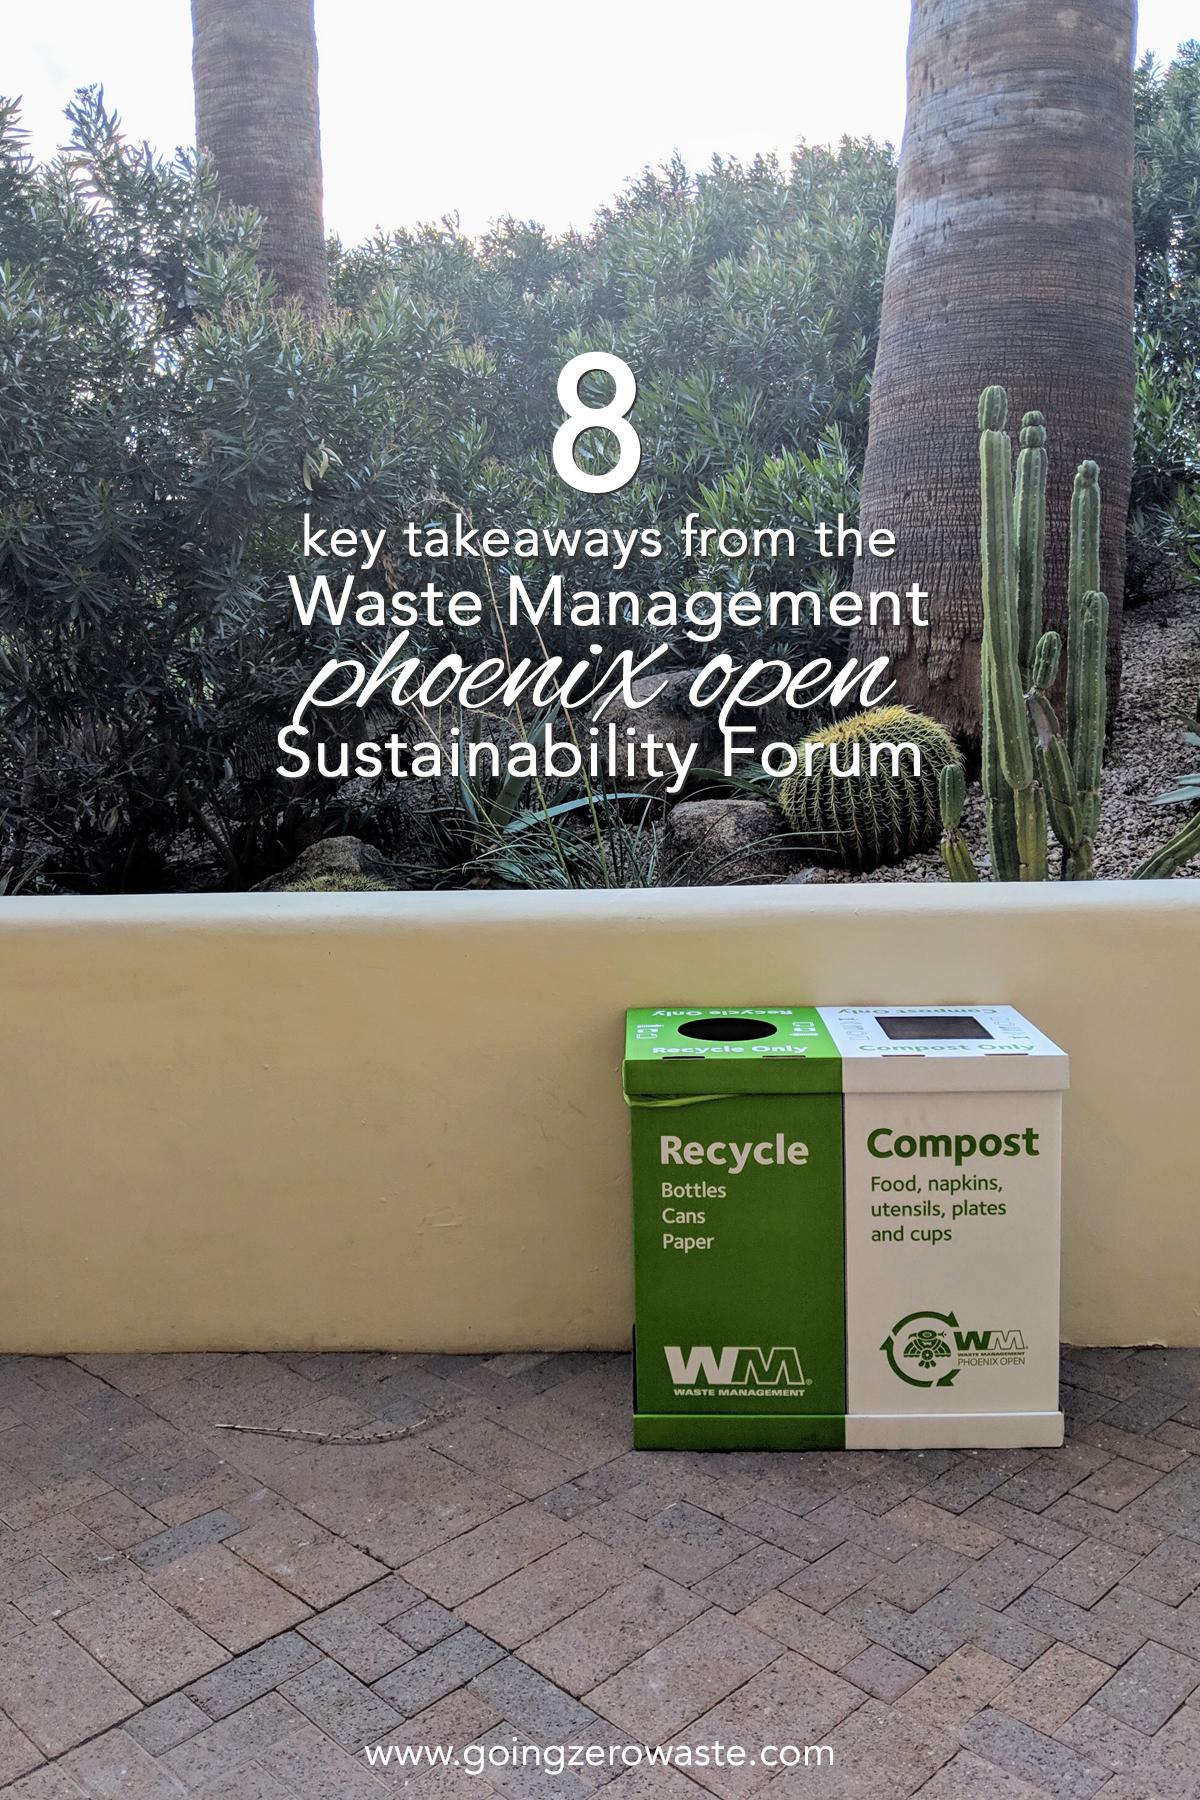 8 key takeaways from the waste management phoenix open sustainability forum from www.goingzerowaste.com